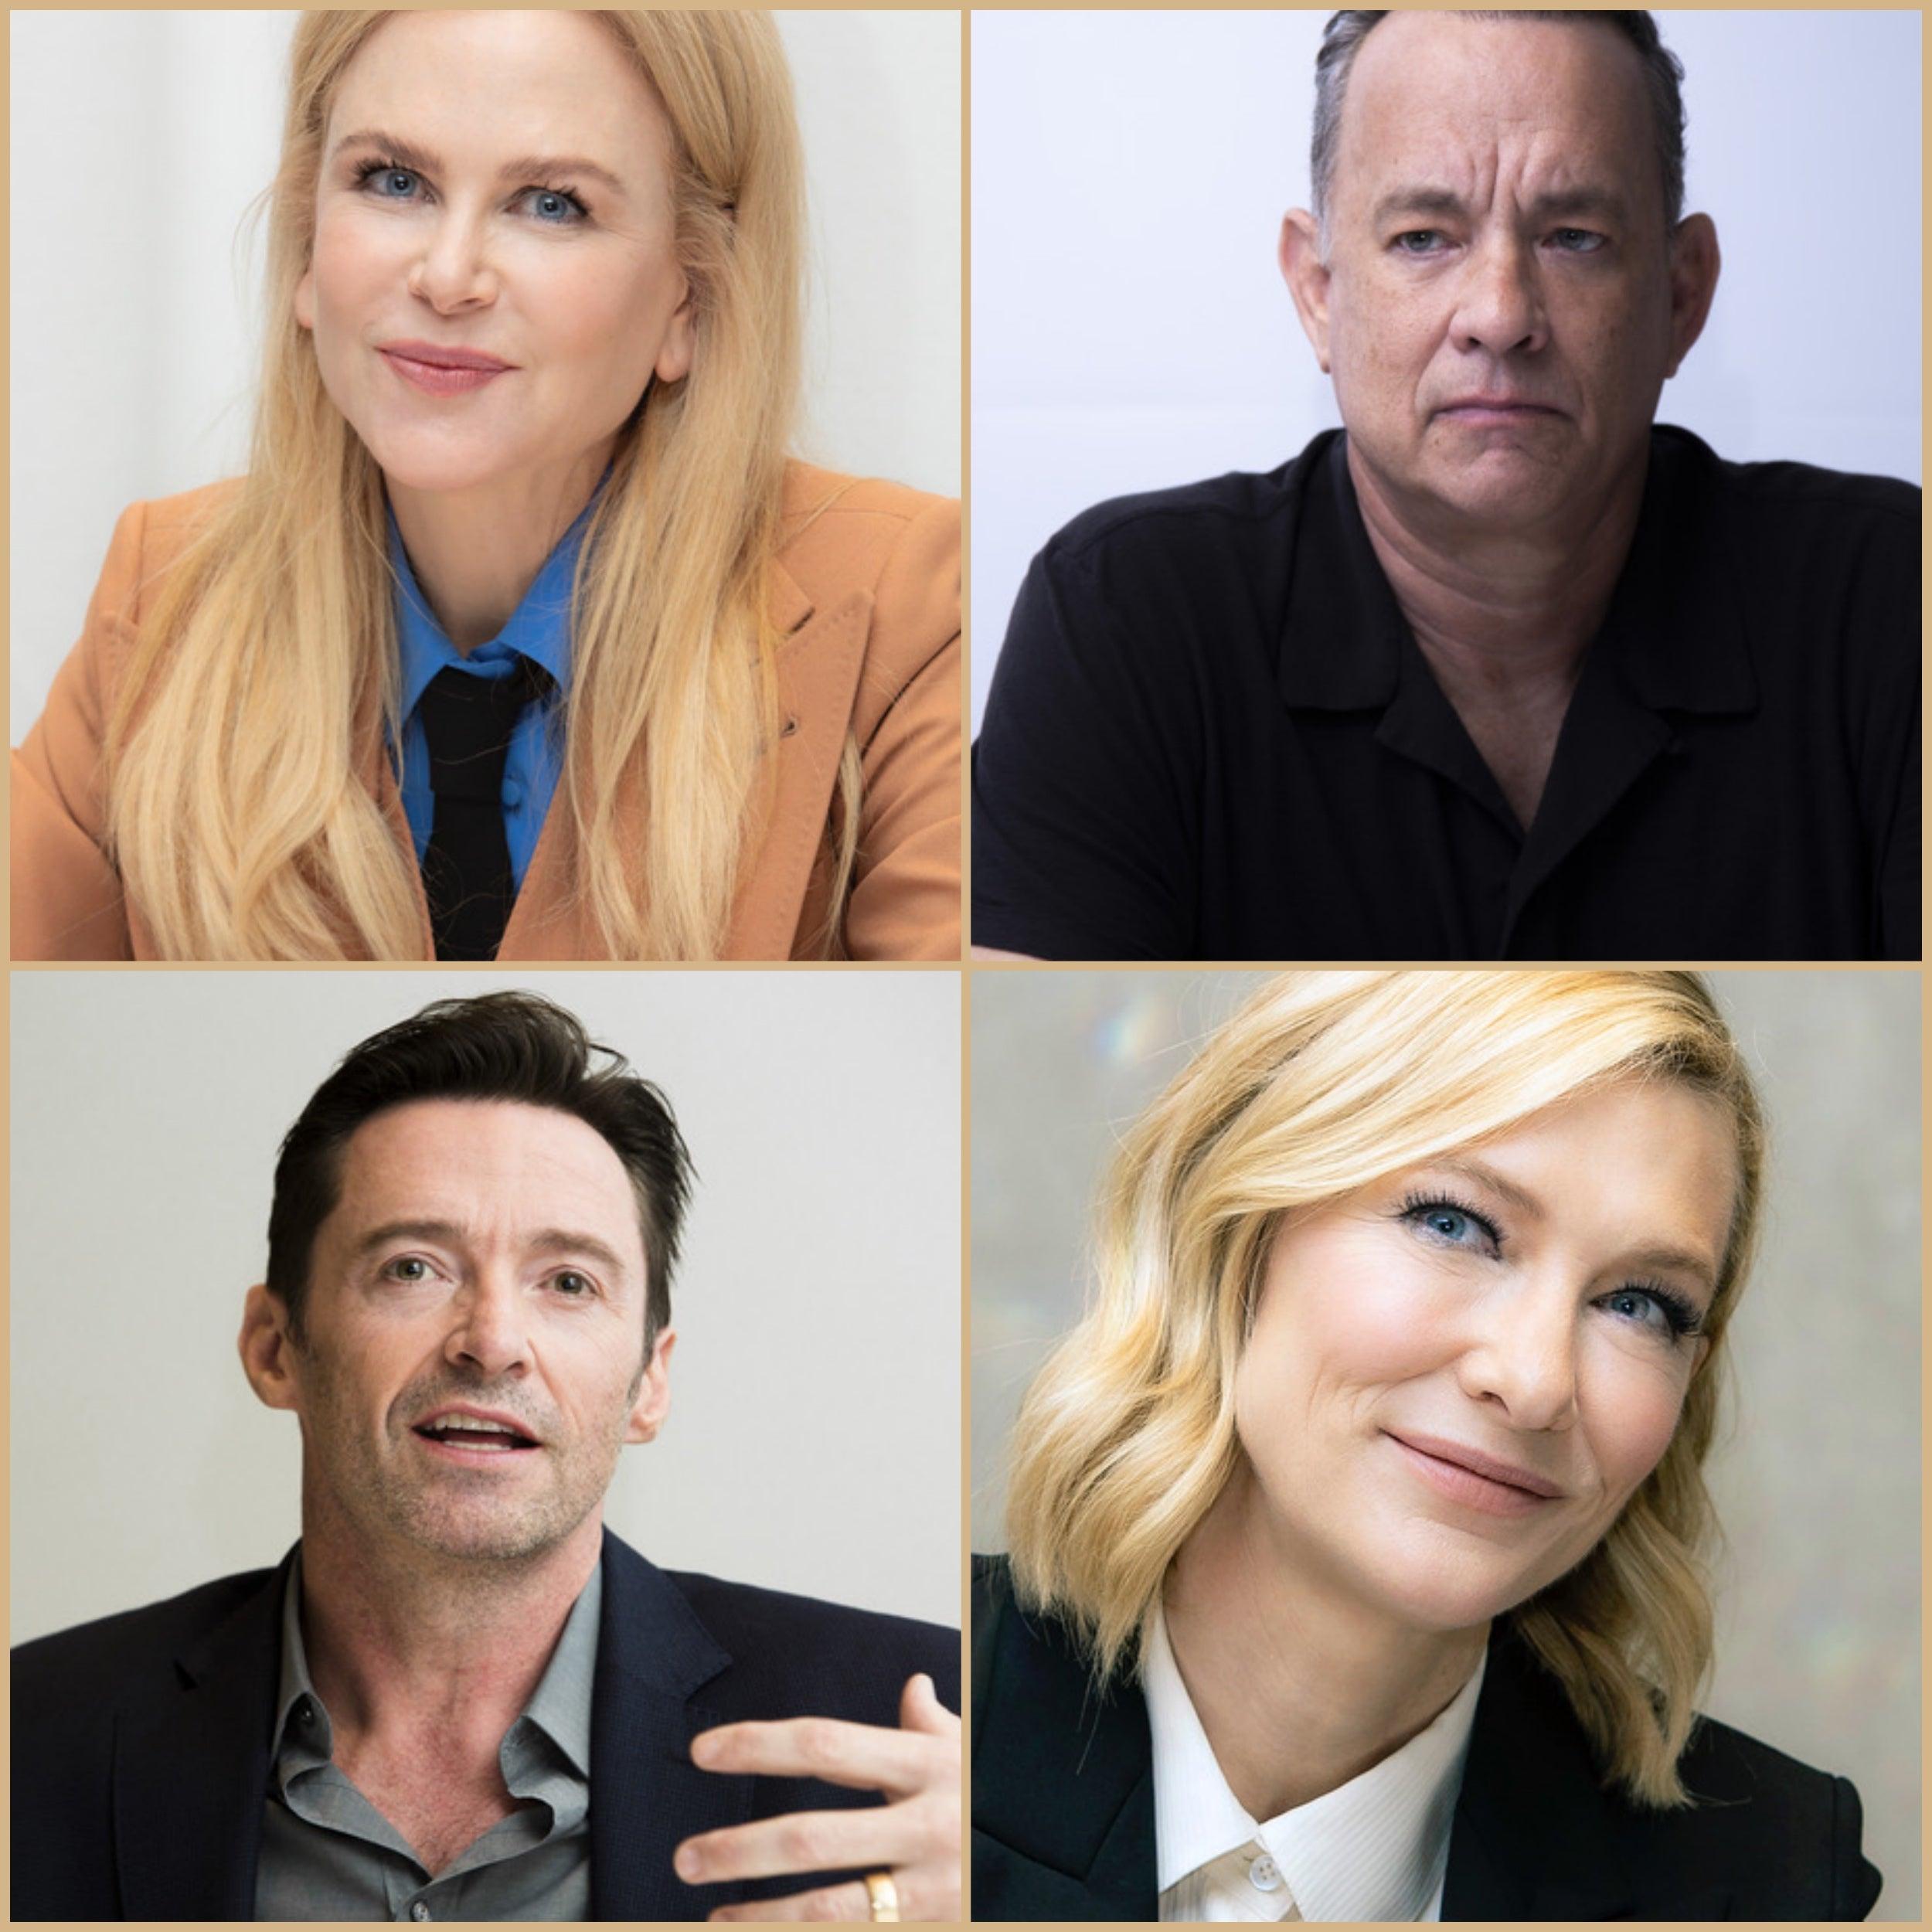 Nicole Kidman, Hugh Jackman, Tom Hanks and Cate Blanchett